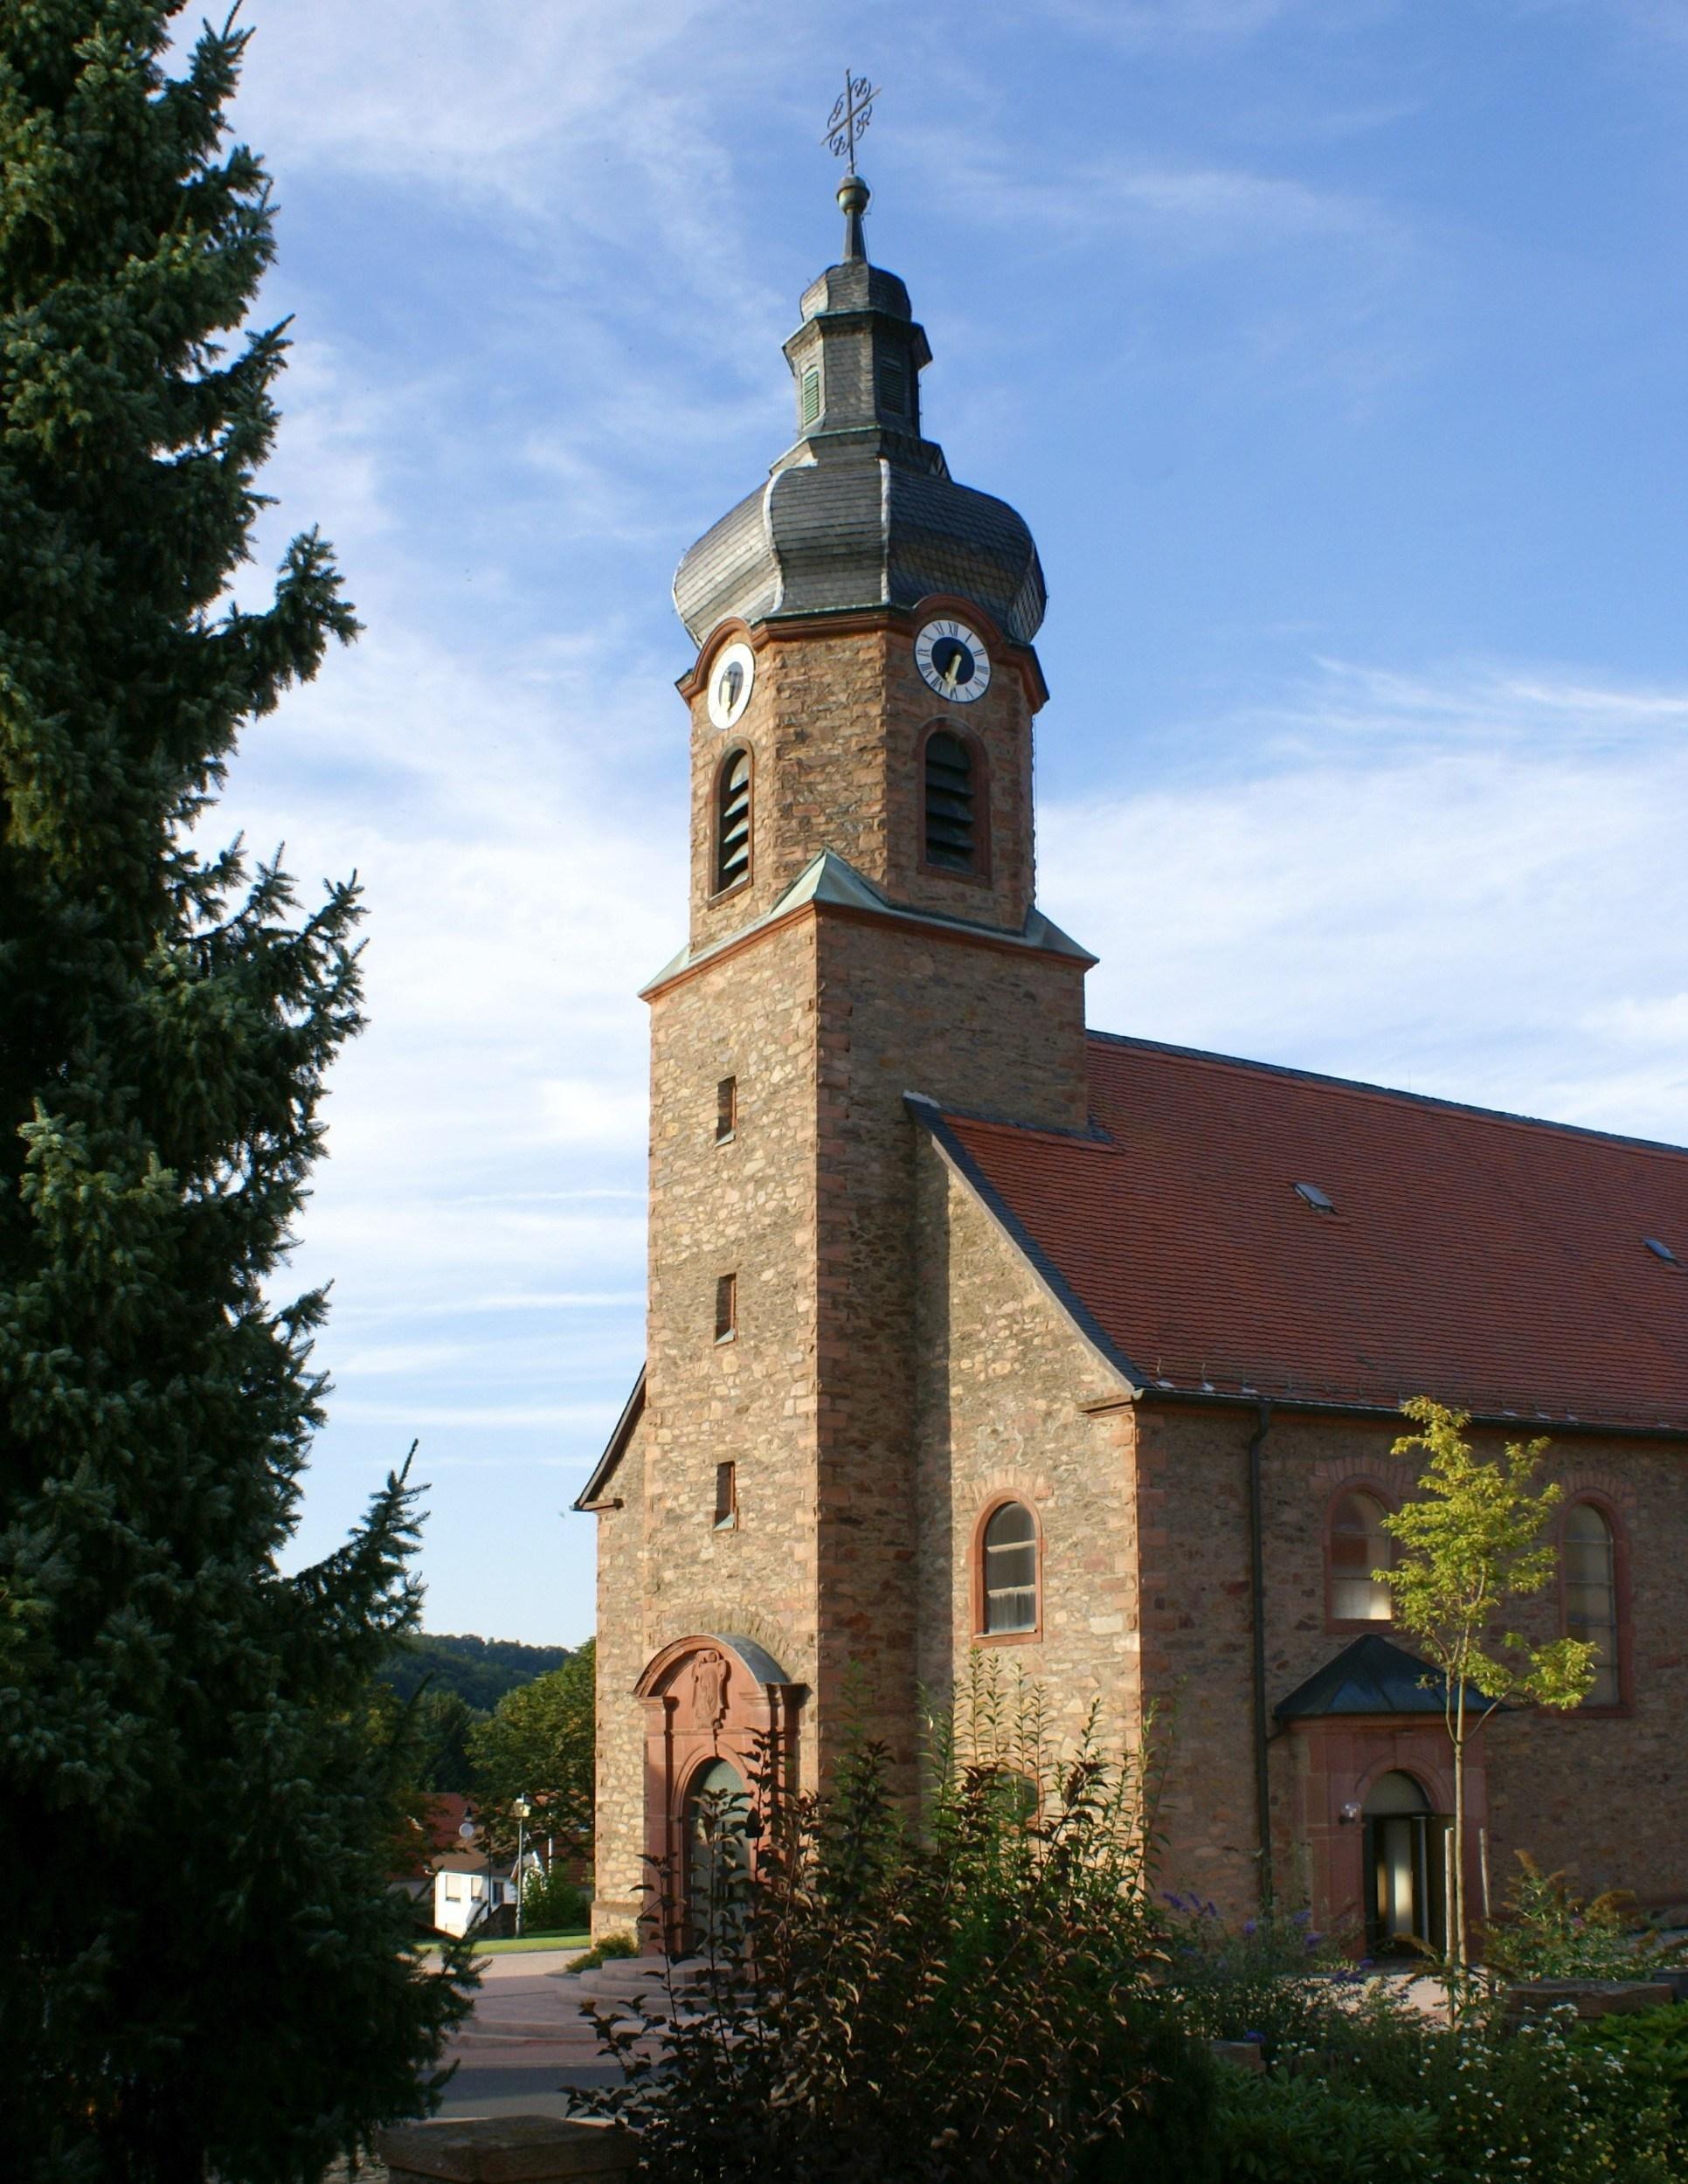 Blankenbach